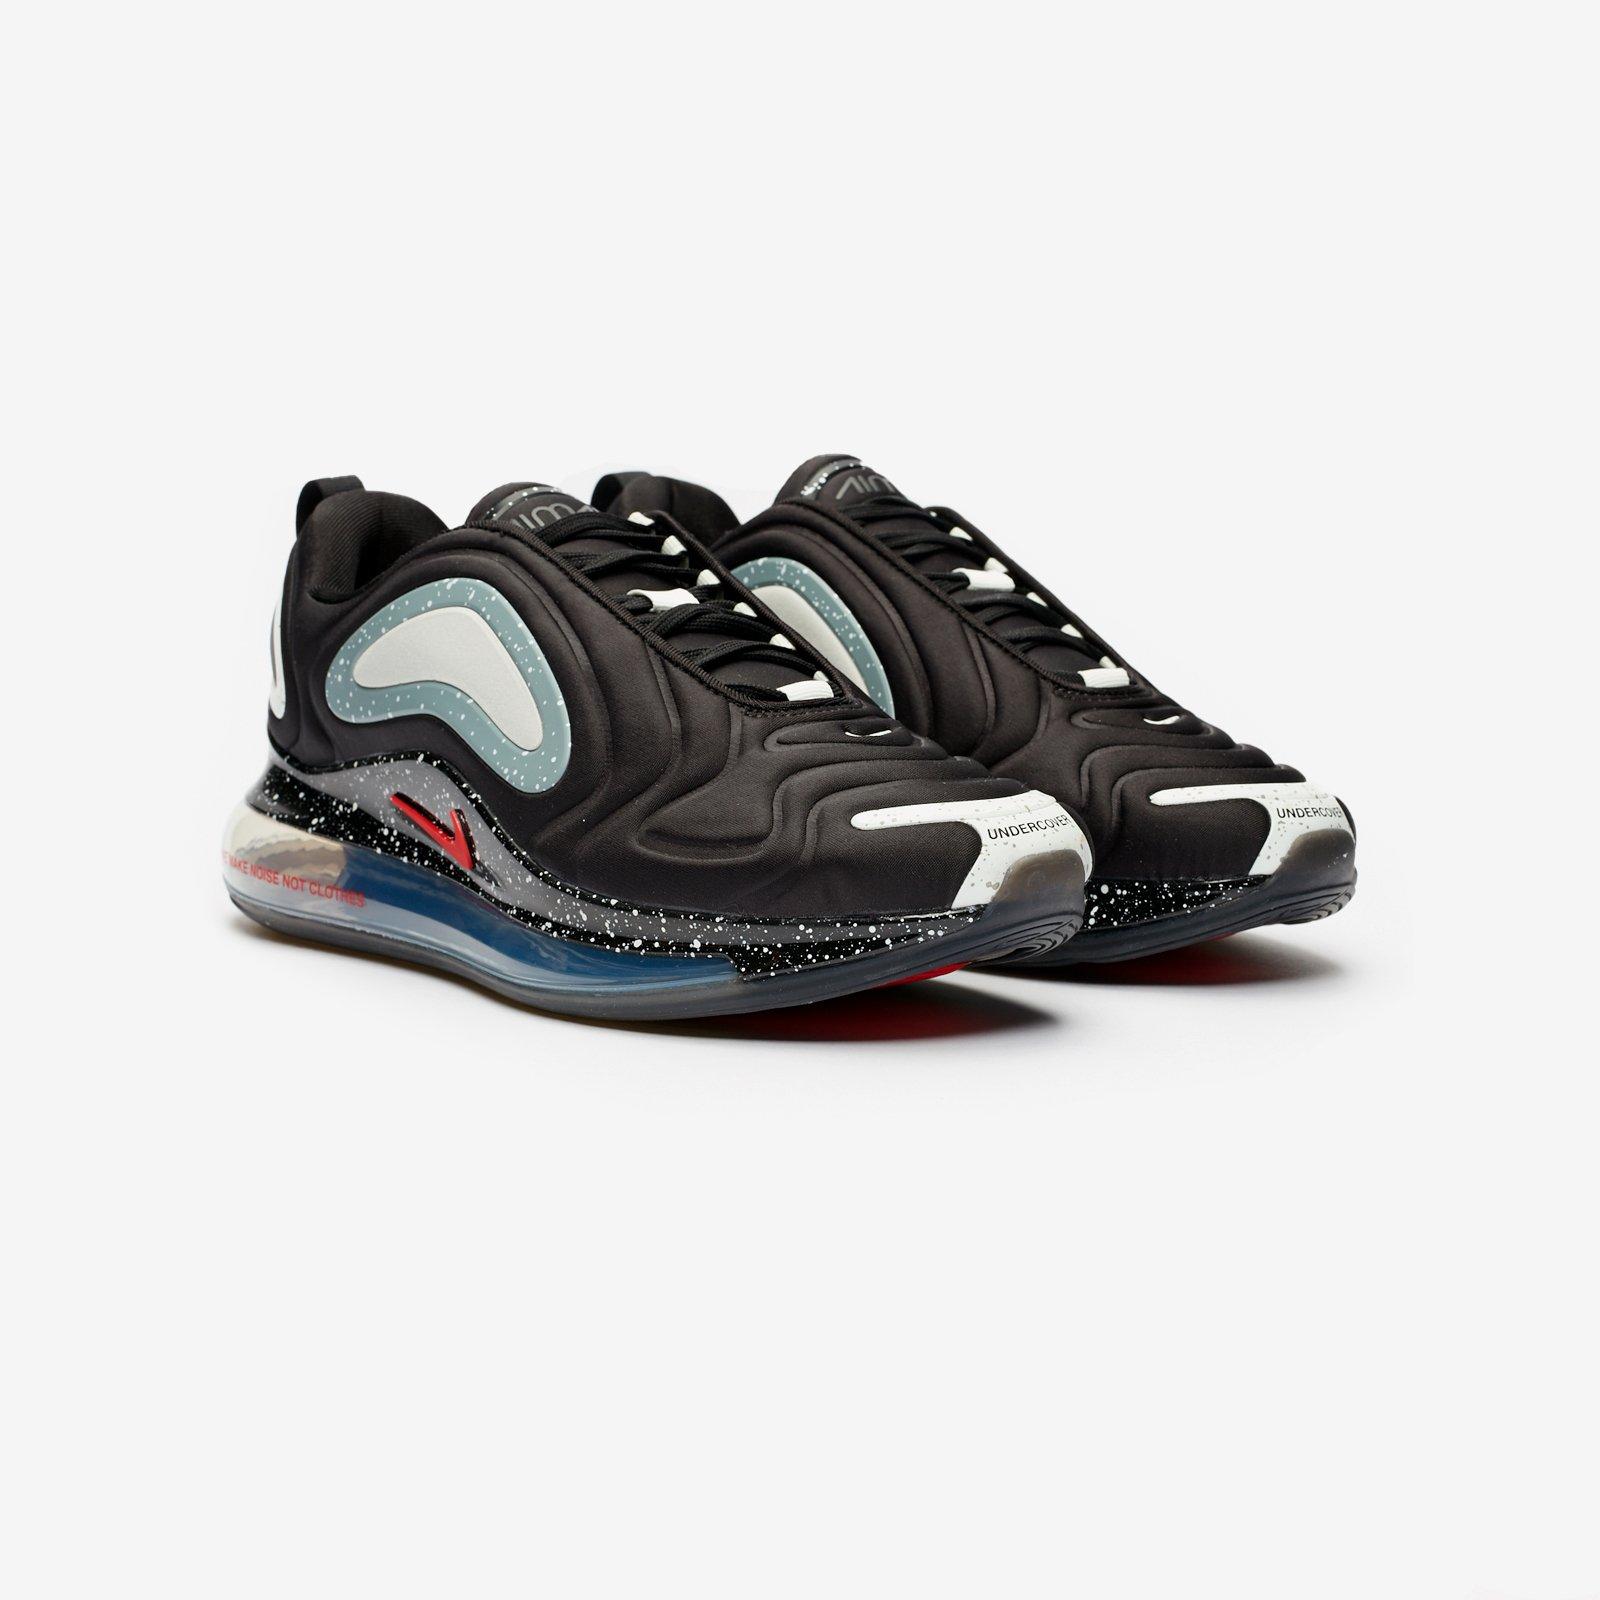 Nike Air Max 720 Undercover Cn2408 001 Sneakersnstuff